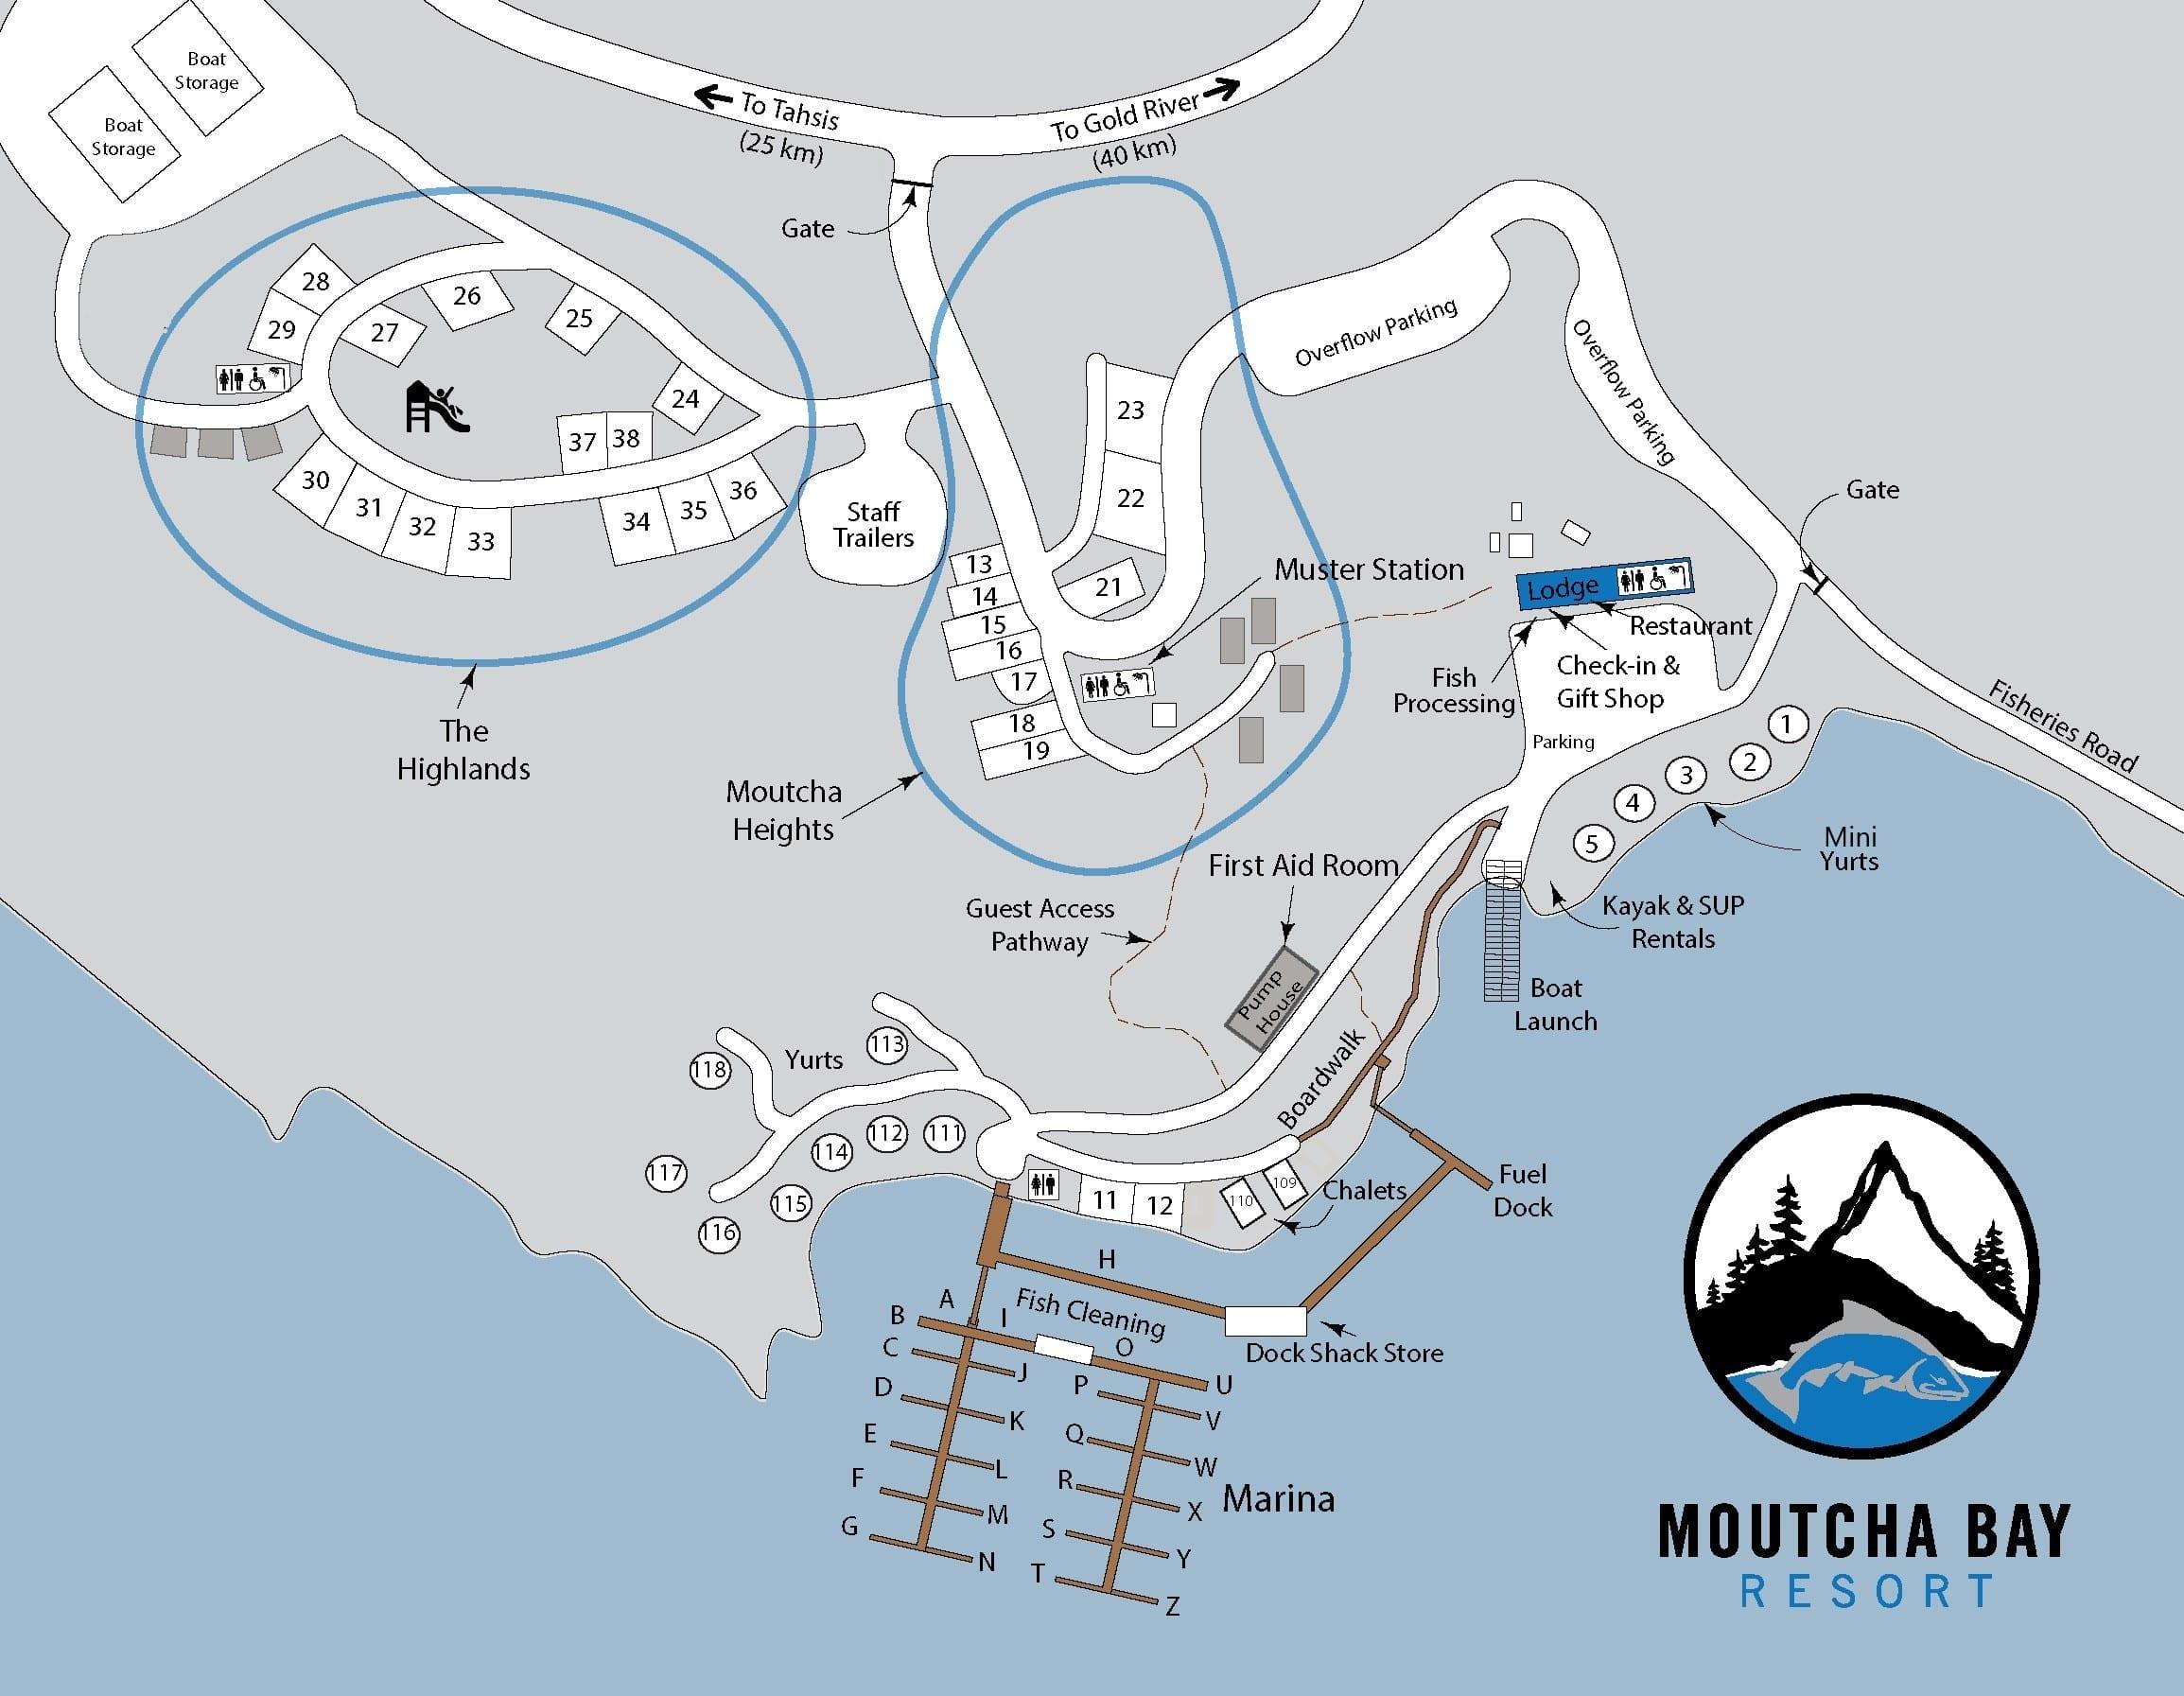 Moutcha Bay Resort Map